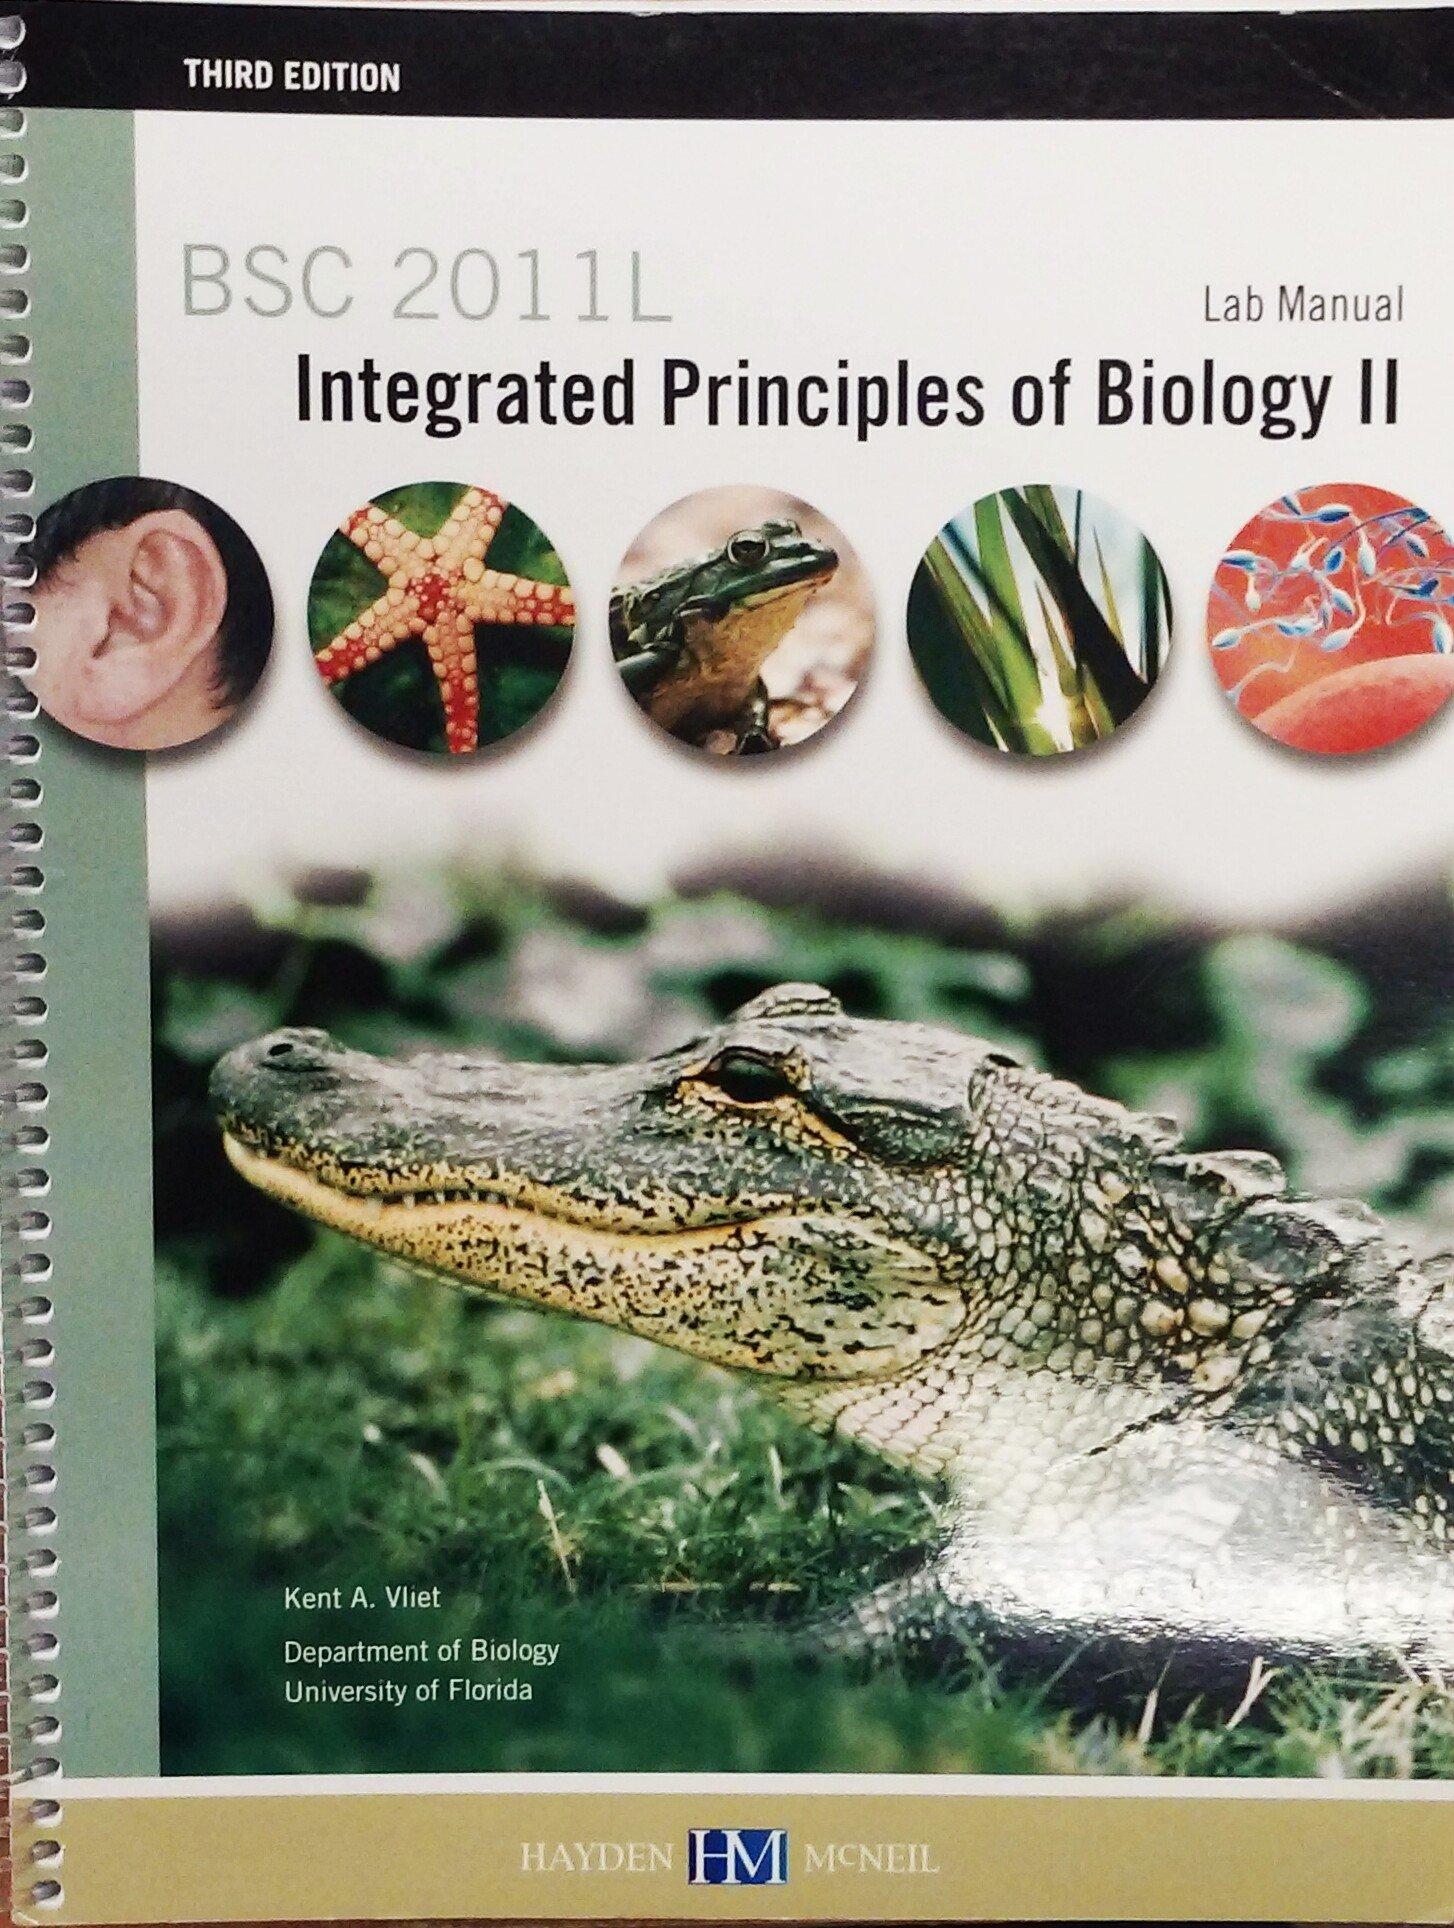 BSC 2011L A Laboratory Manual for Integrated Principles of Biology II: Kent  A. Vliet: 9780738049670: Amazon.com: Books